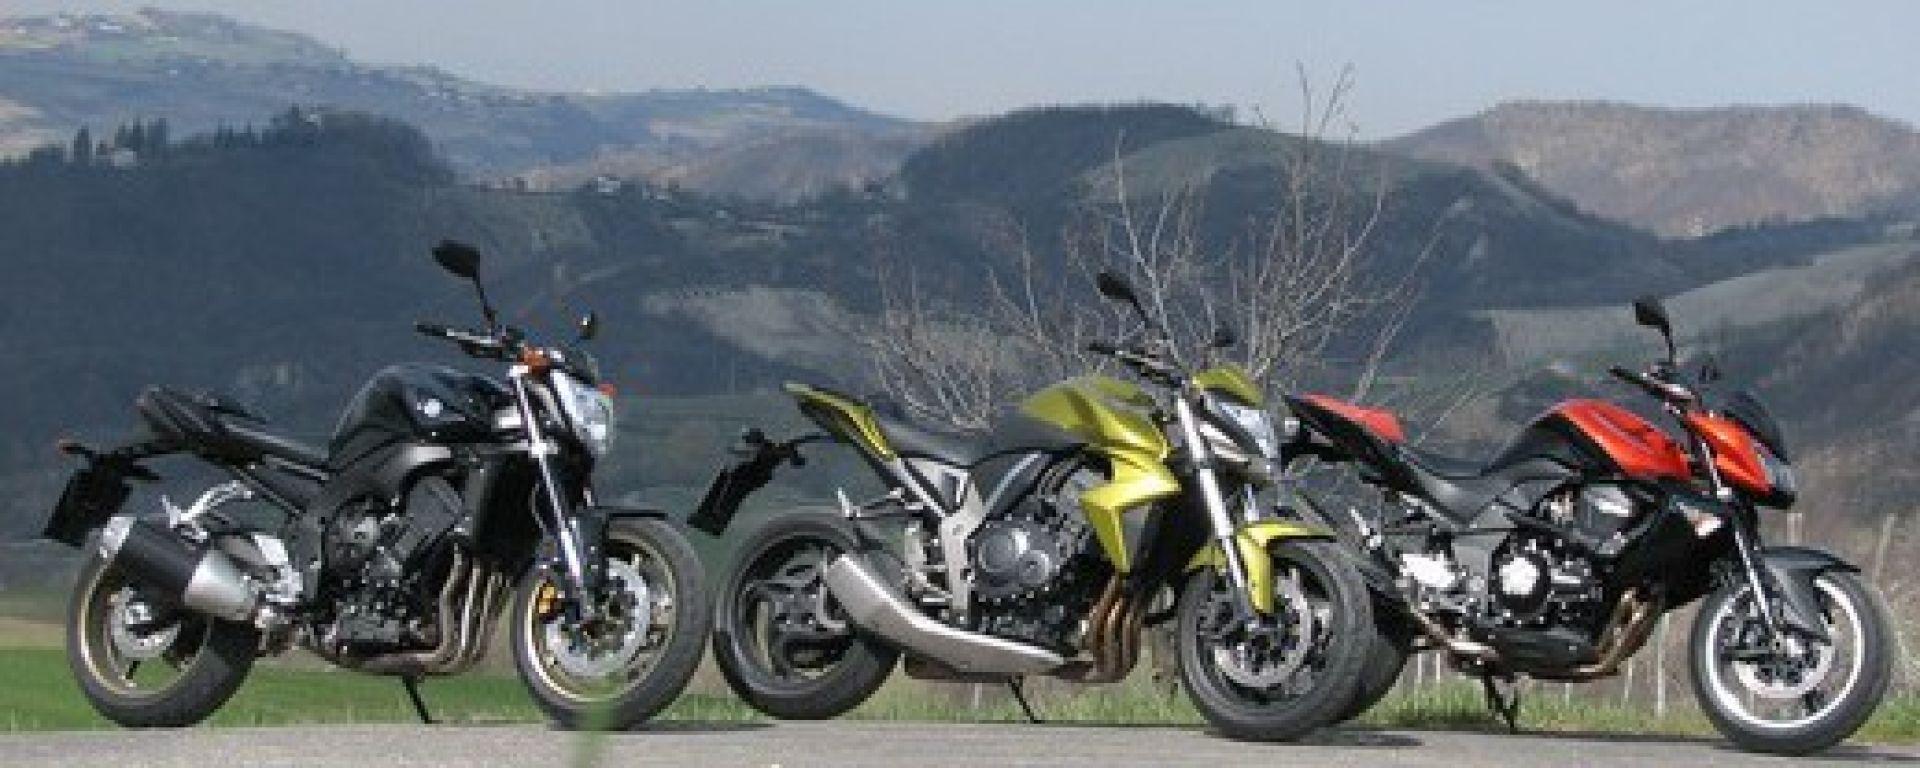 Confronto Naked 1000 Jap Motorbox